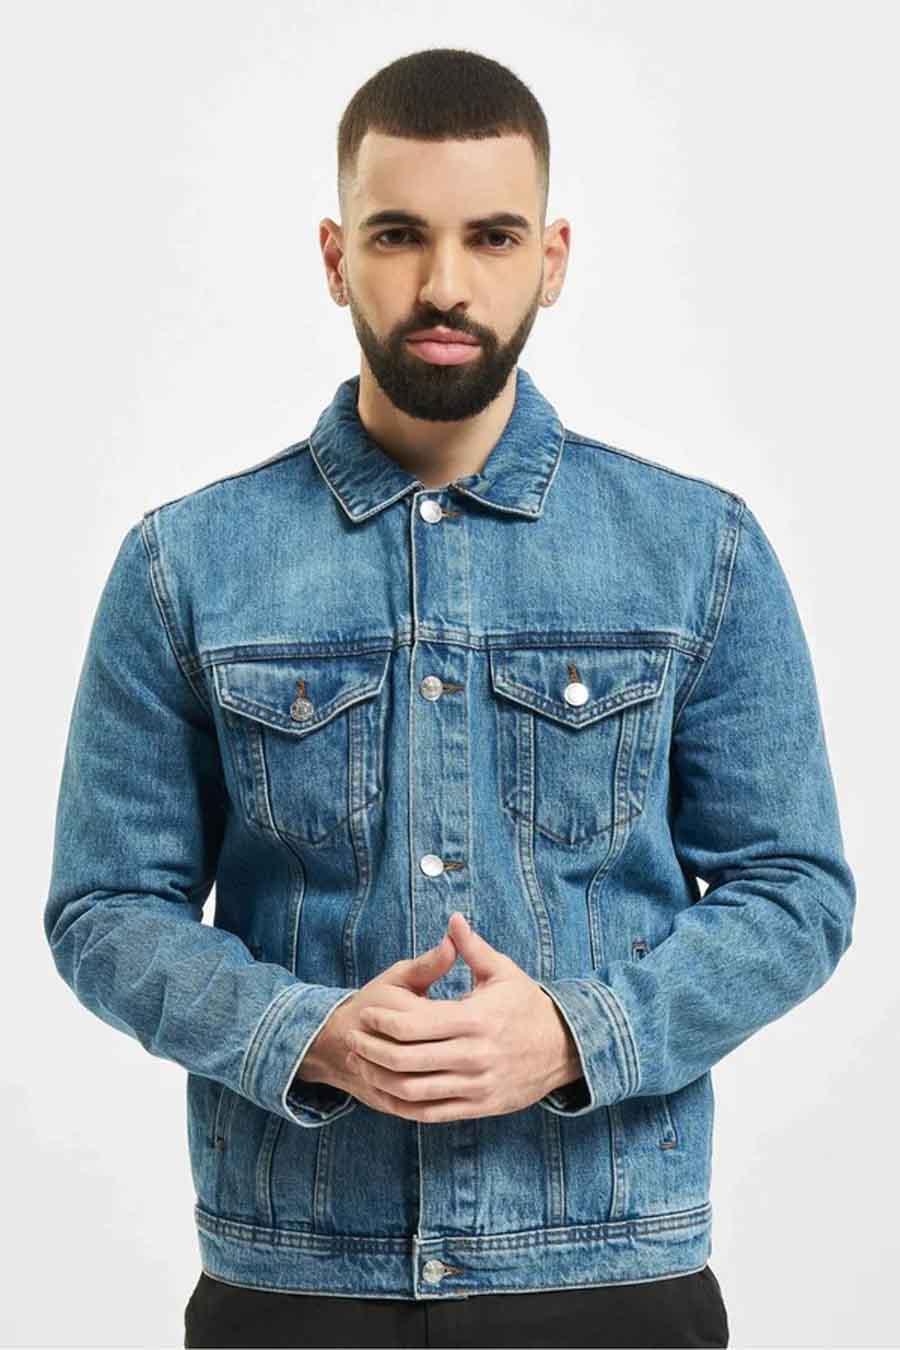 Denim Project Jas jeans, Denim, Heren, Maat: L/M/S